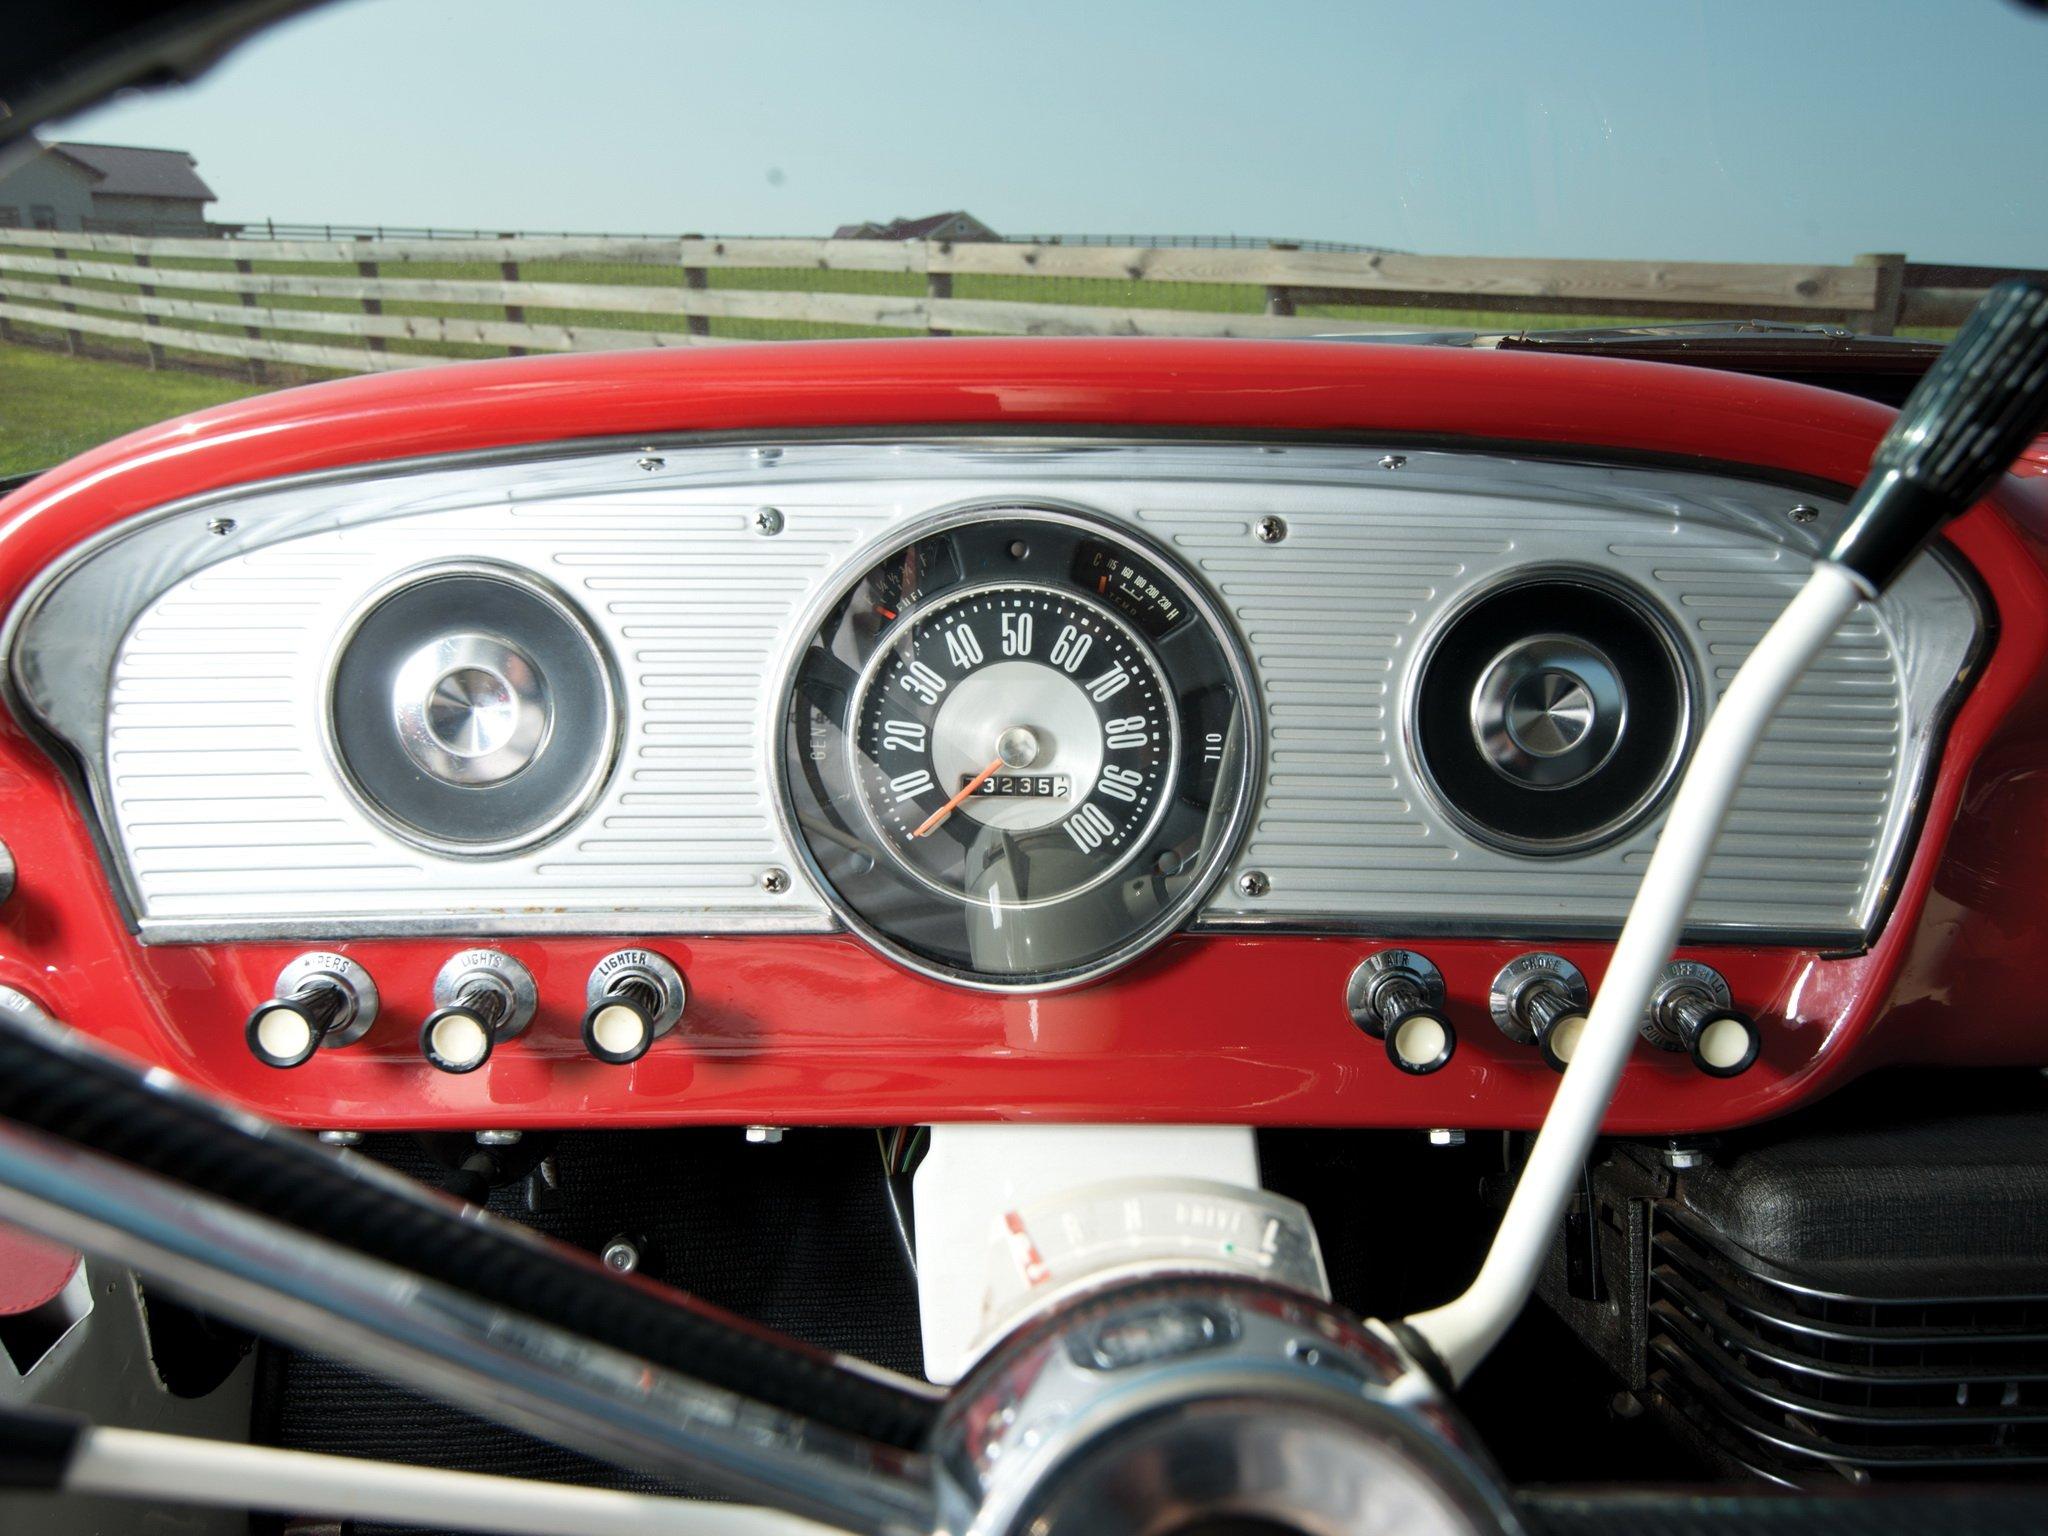 1963 Ford F 100 Custom Cab Styleside Pickup F100 Classic Wallpaper 1970 Stepside 2048x1536 452075 Wallpaperup